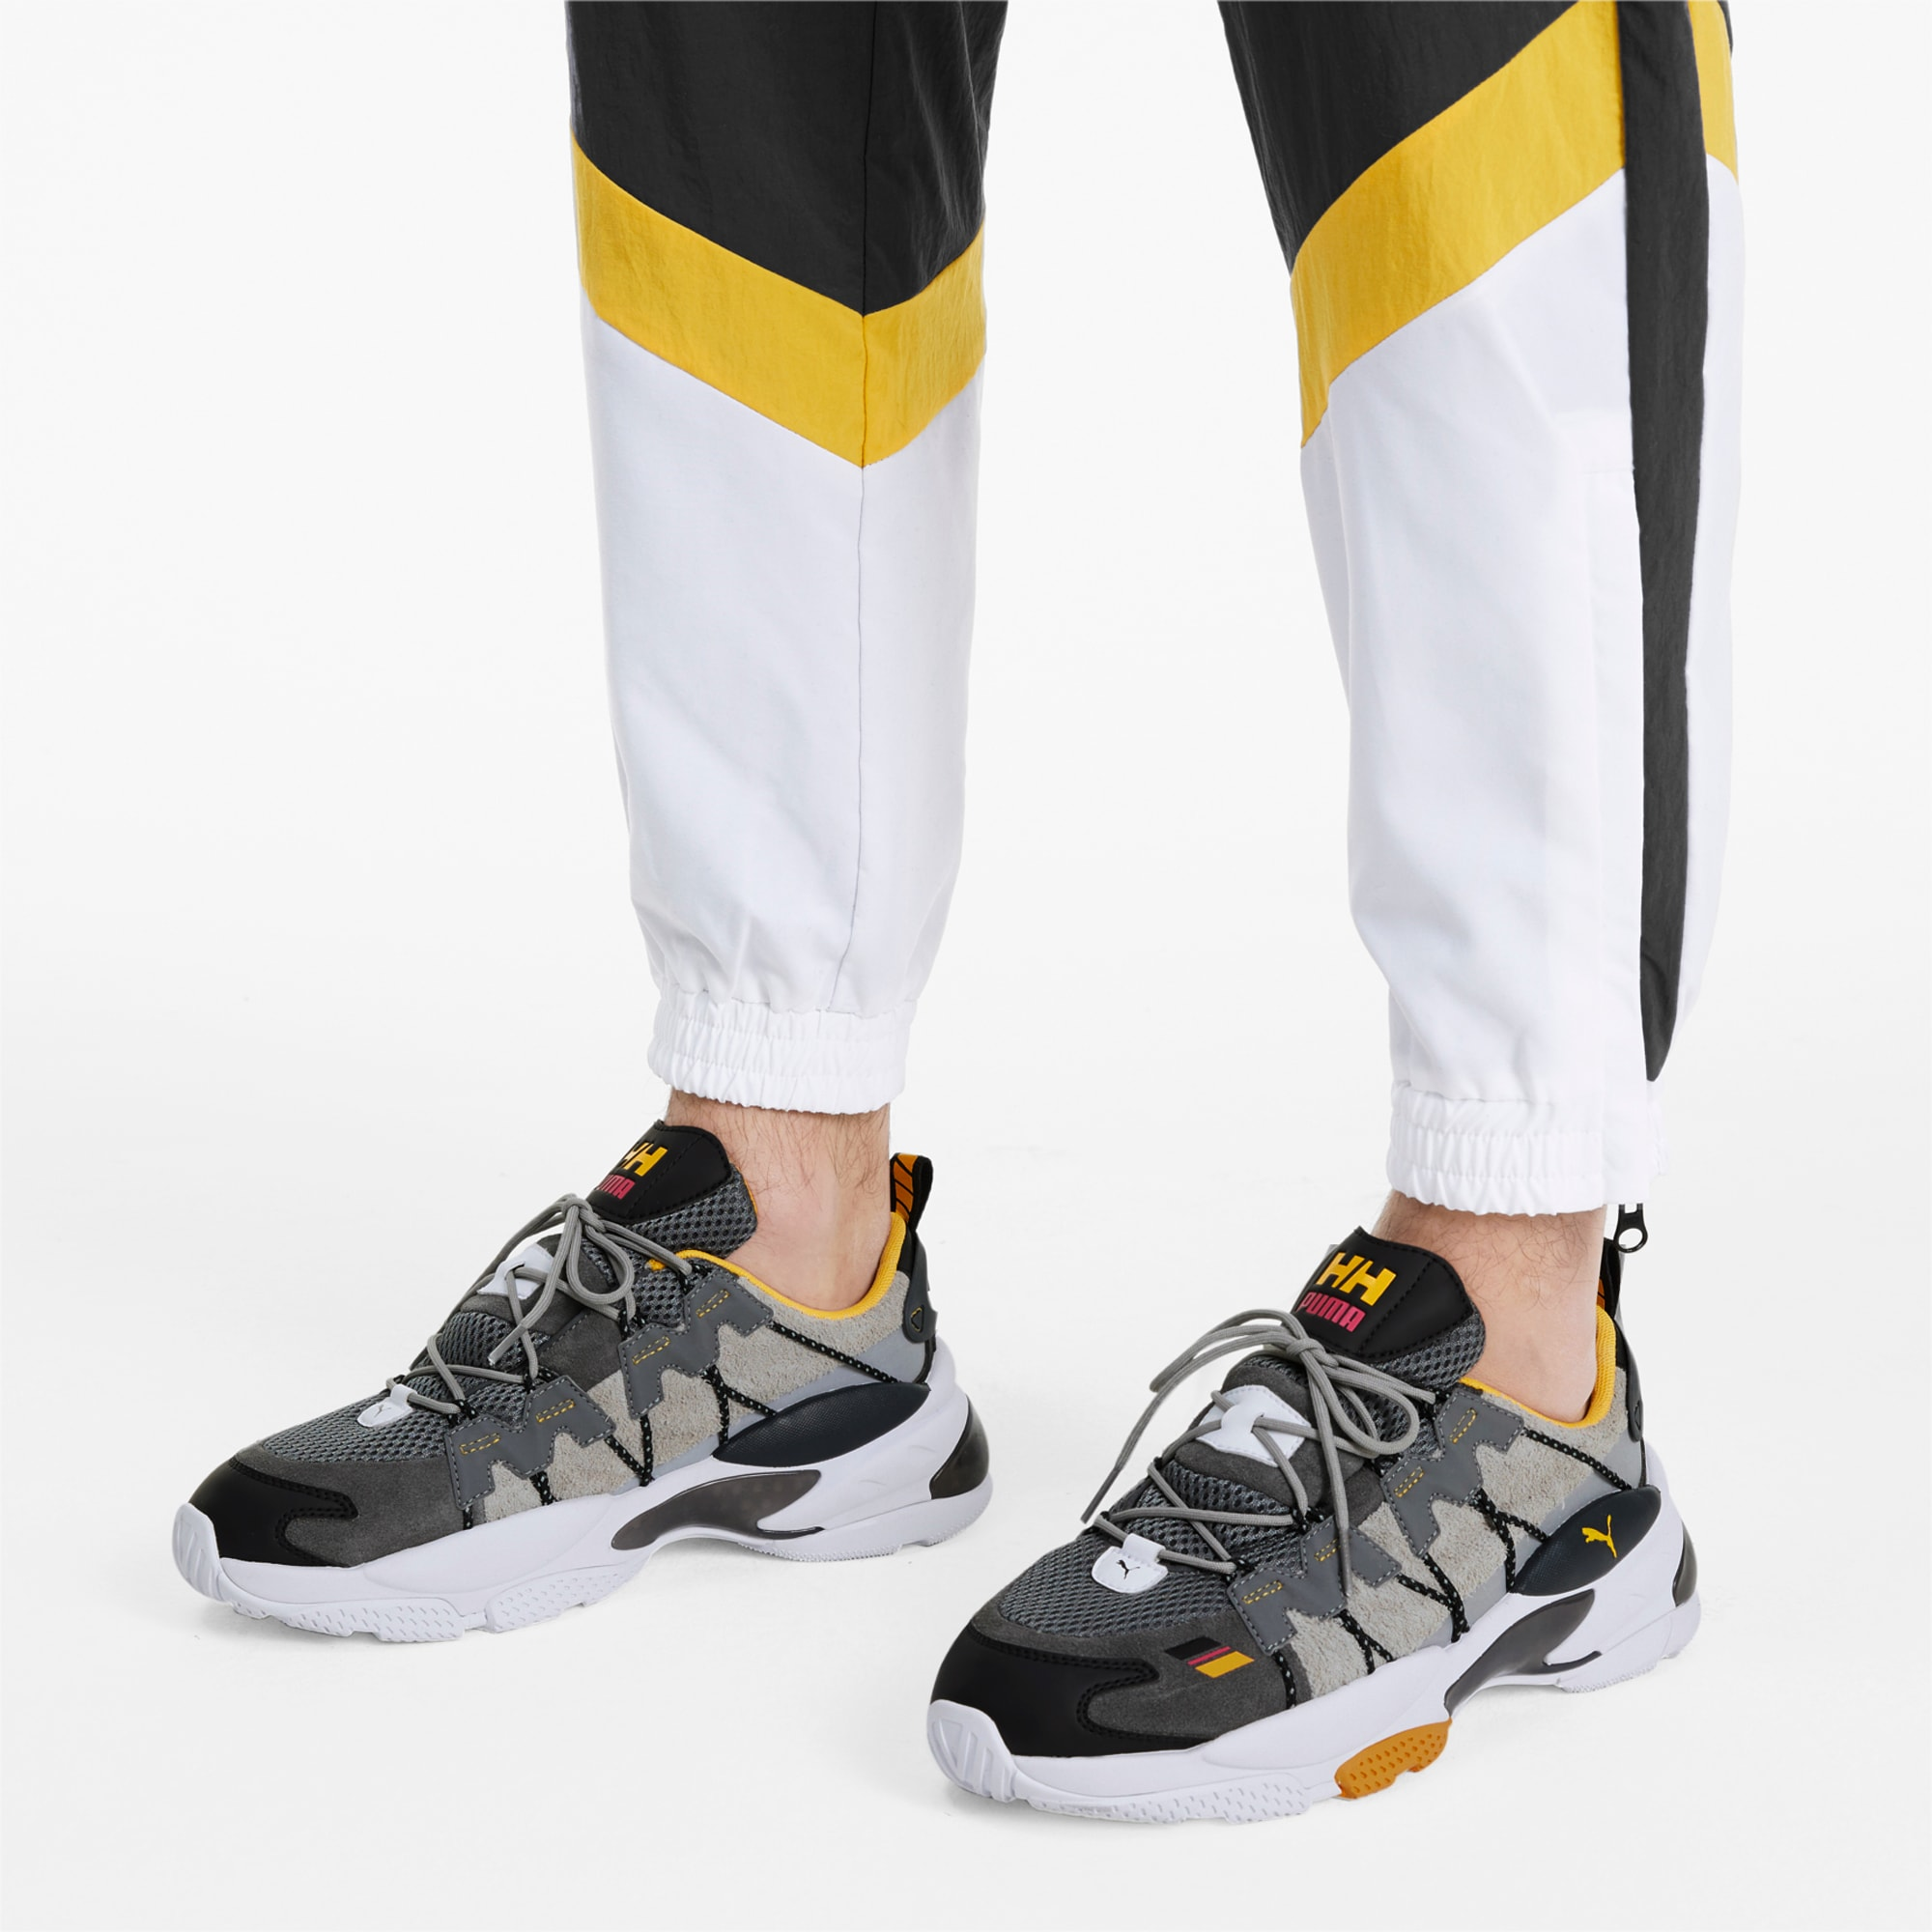 PUMA x HELLY HANSEN LQDCELL Sneakers